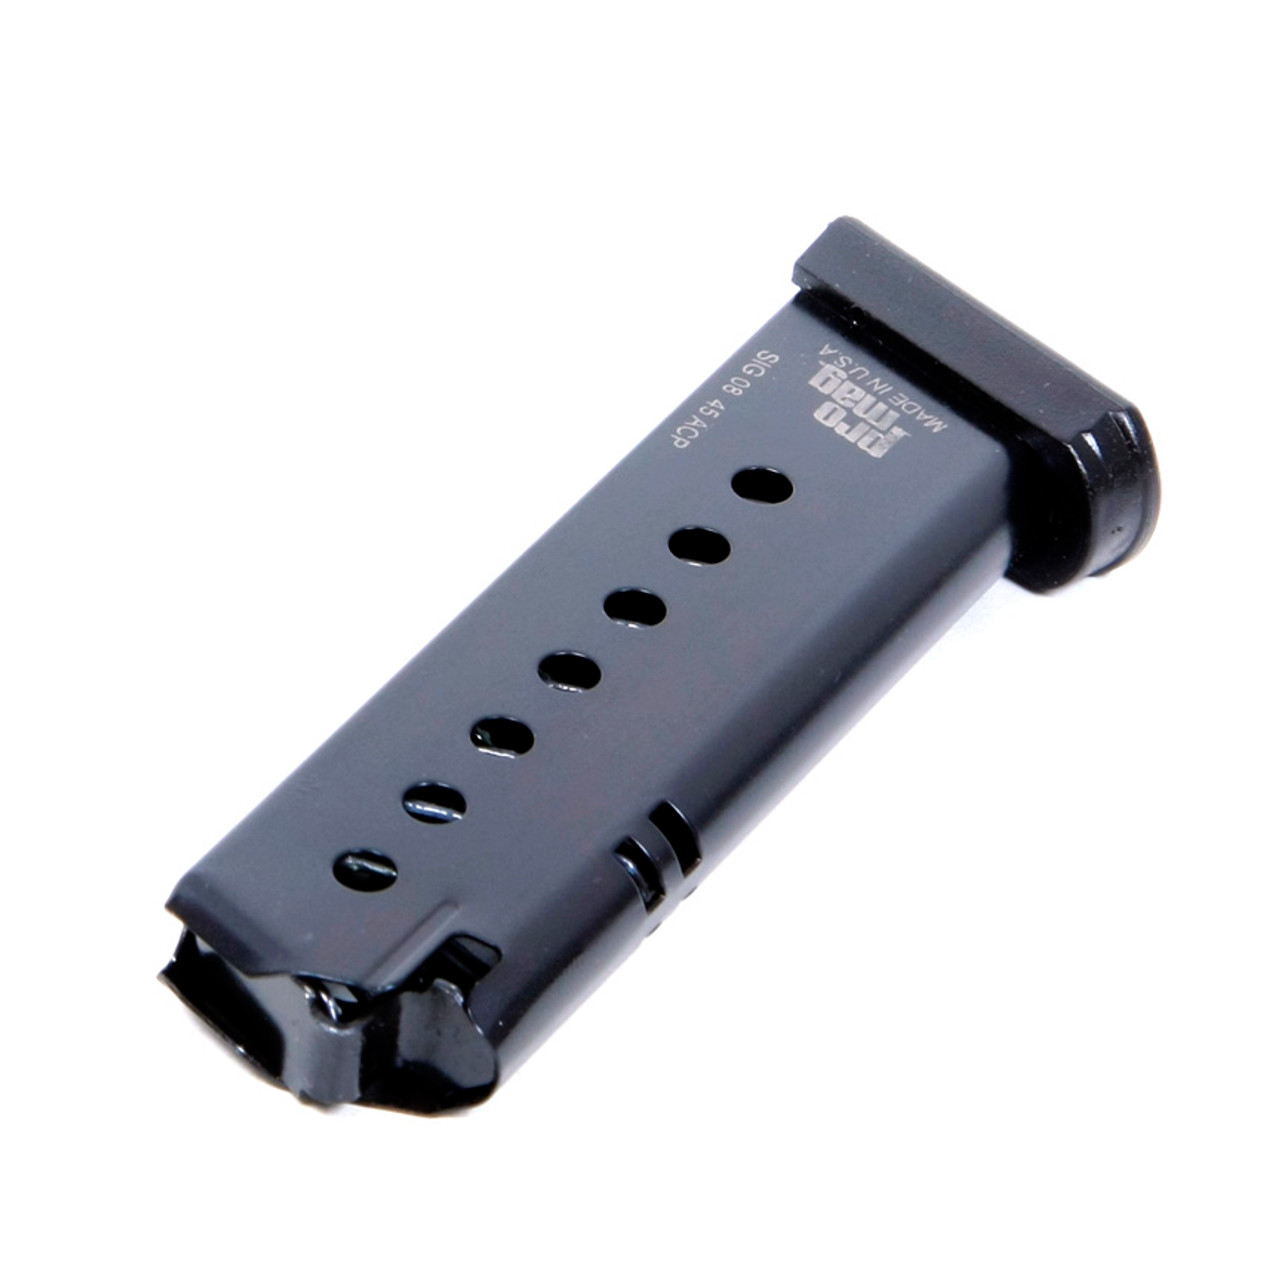 Sig Sauer® P220™ .45 ACP (8)Rd - Blue Steel